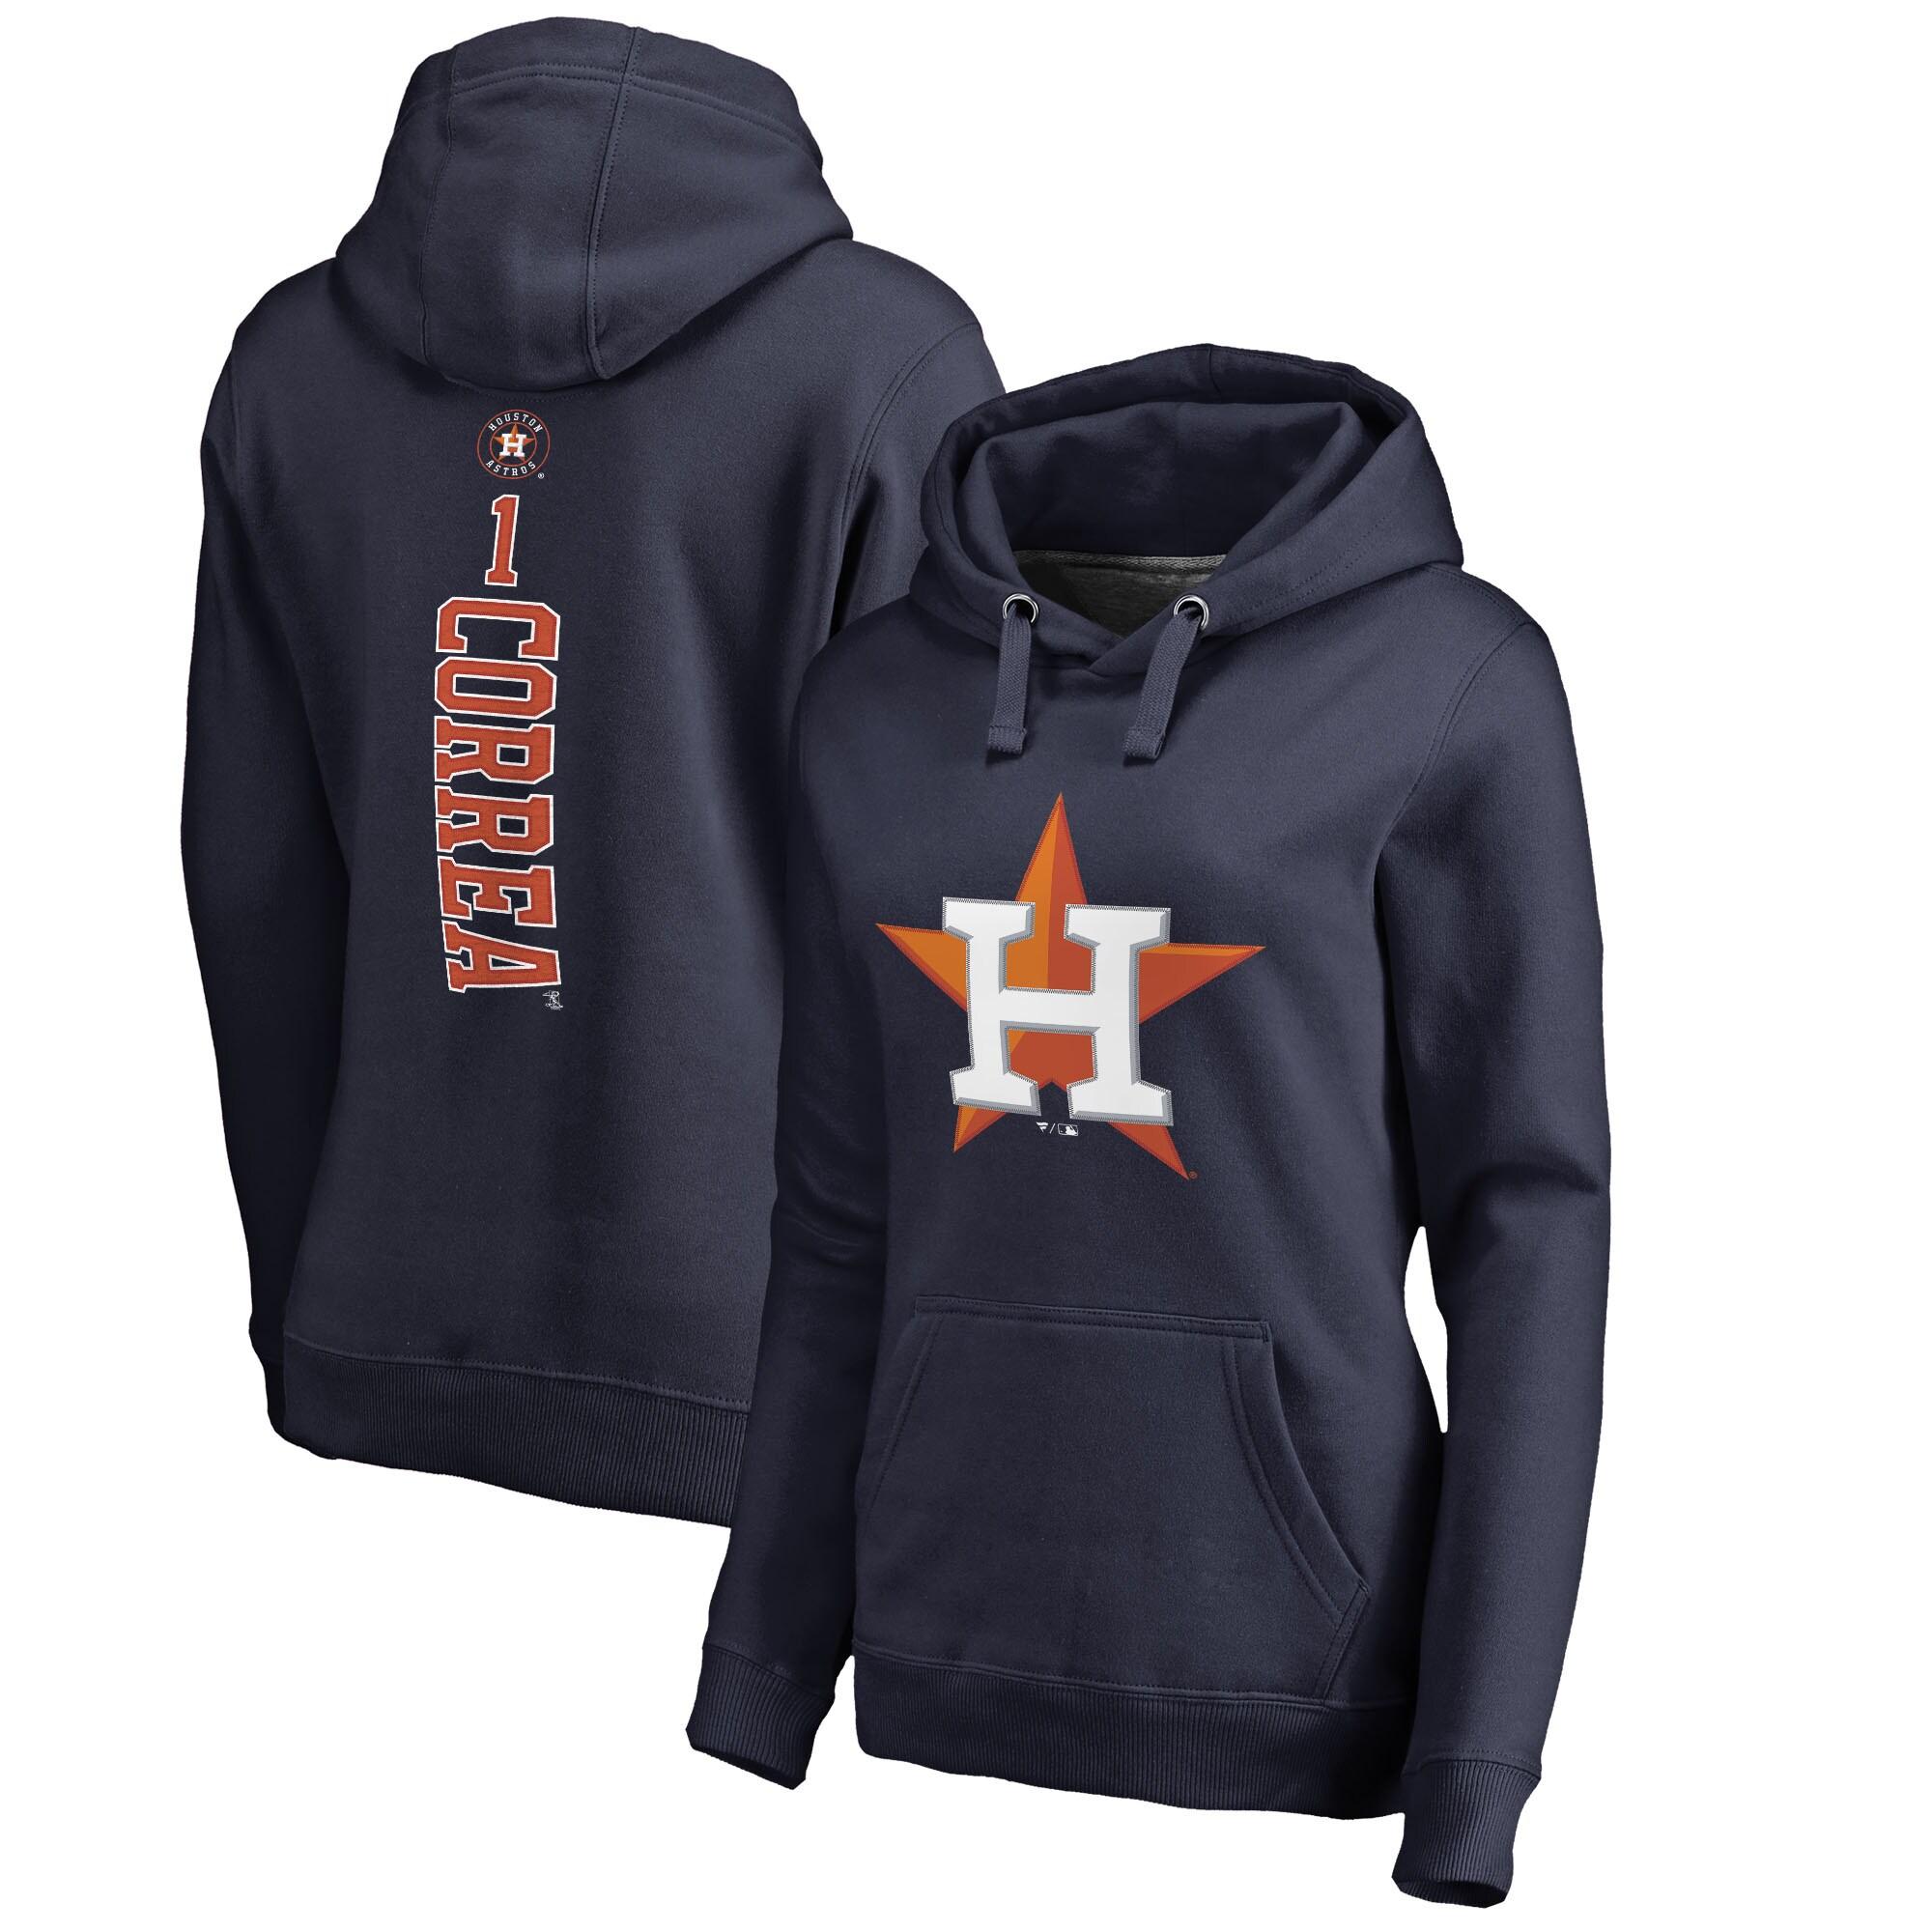 Carlos Correa Houston Astros Fanatics Branded Women's Backer Pullover Hoodie - Navy